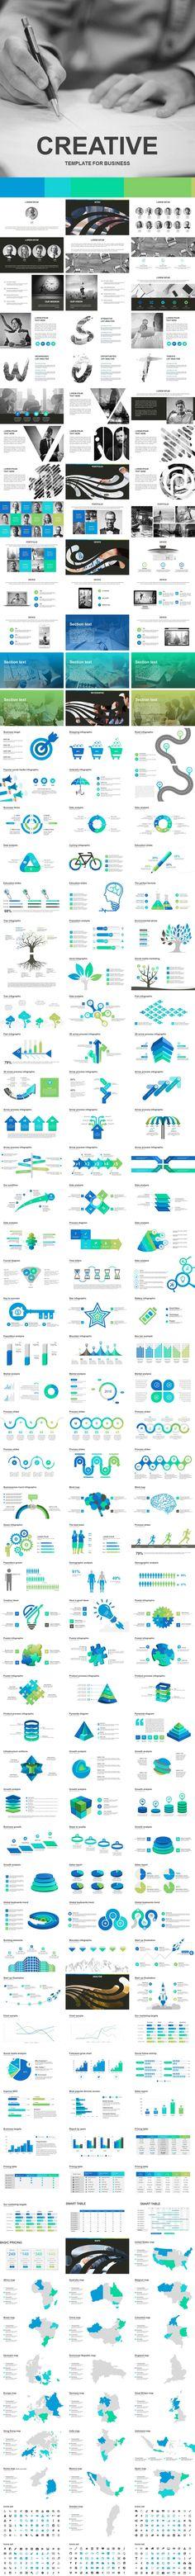 Creative Powerpoint Template — Powerpoint PPTX #enterprise #investor • Download ➝ https://graphicriver.net/item/creative-powerpoint-template/18876372?ref=pxcr